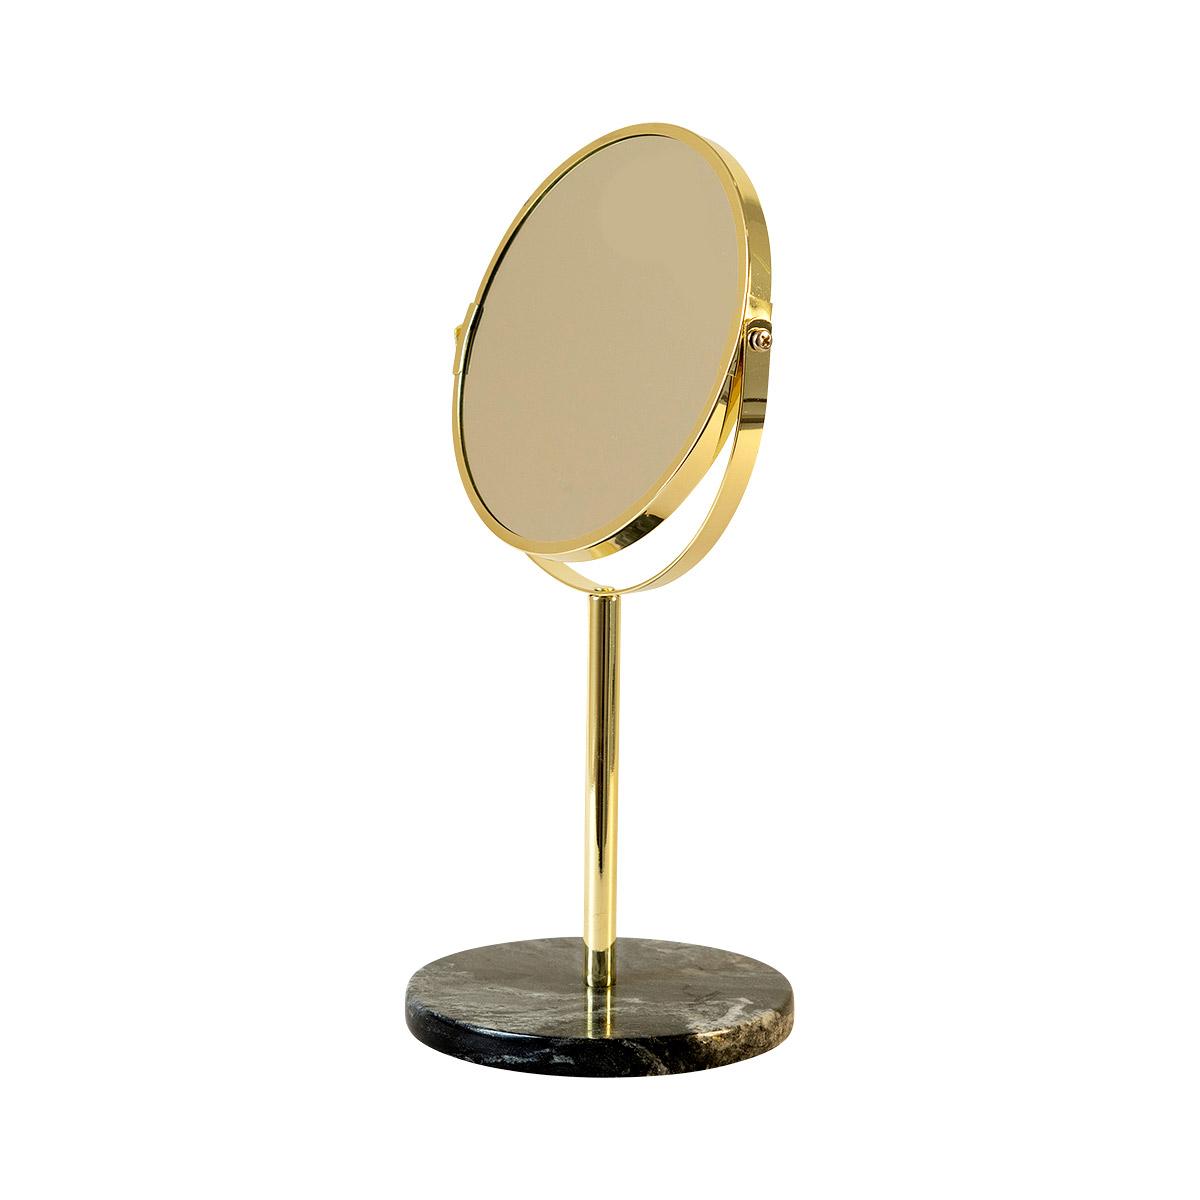 MOUD Home Reflections bordspejl – sort marmor